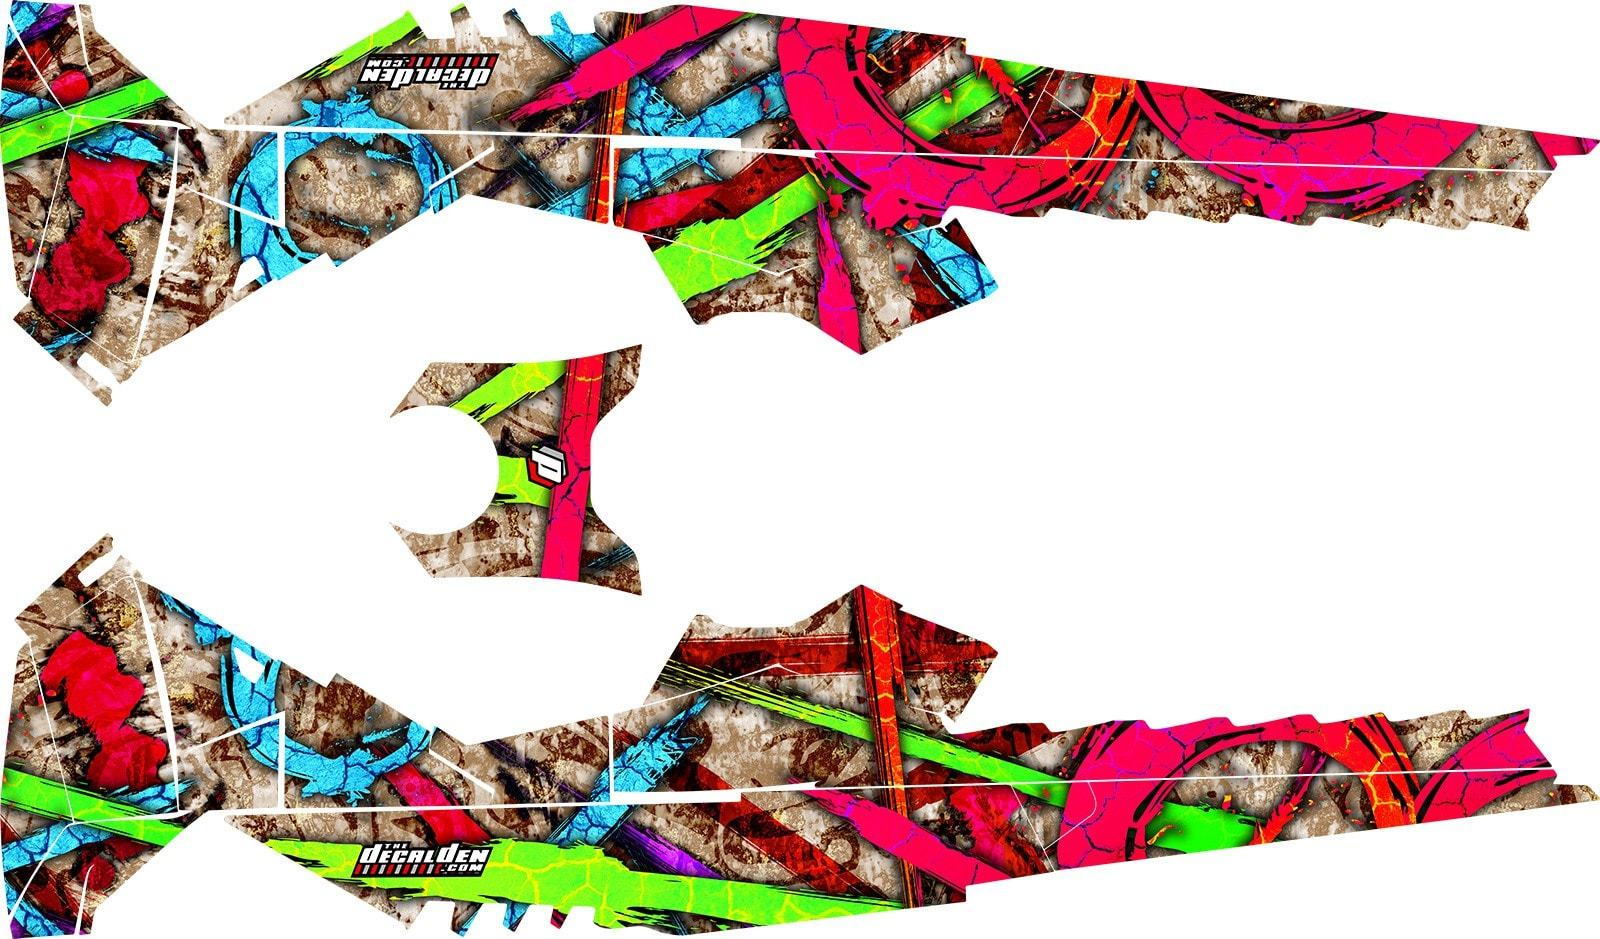 1600x939 Graffiti Xm Premium Grade Sled Wrap Ski Doo Xm Rev Summit Sm